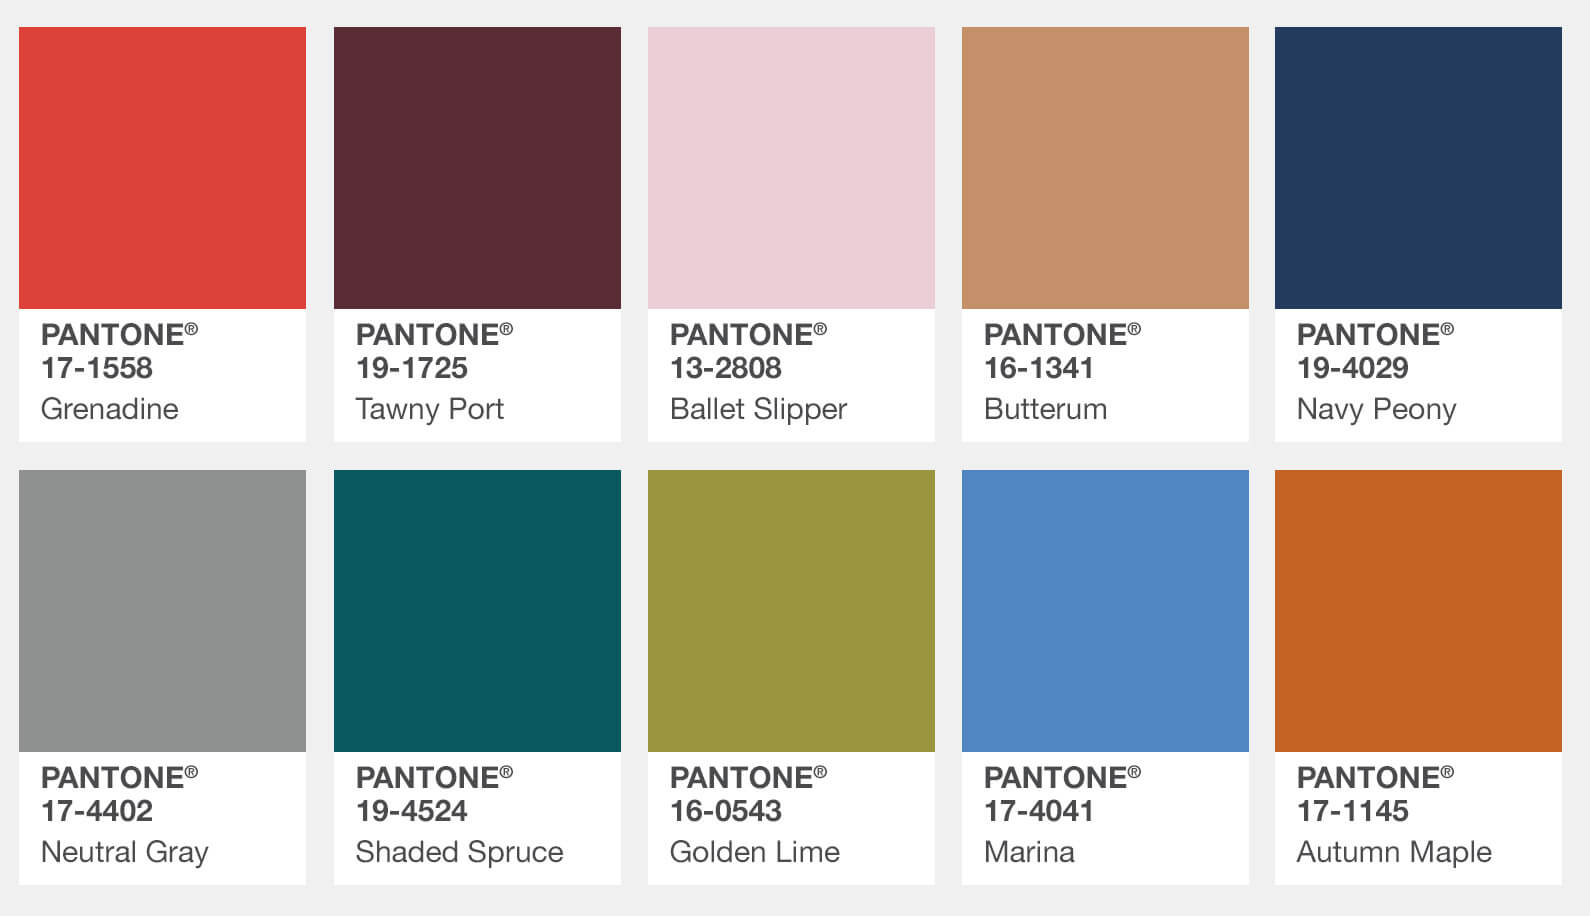 Pantone Color Institute Releases Fall 2017 Fashion Colour